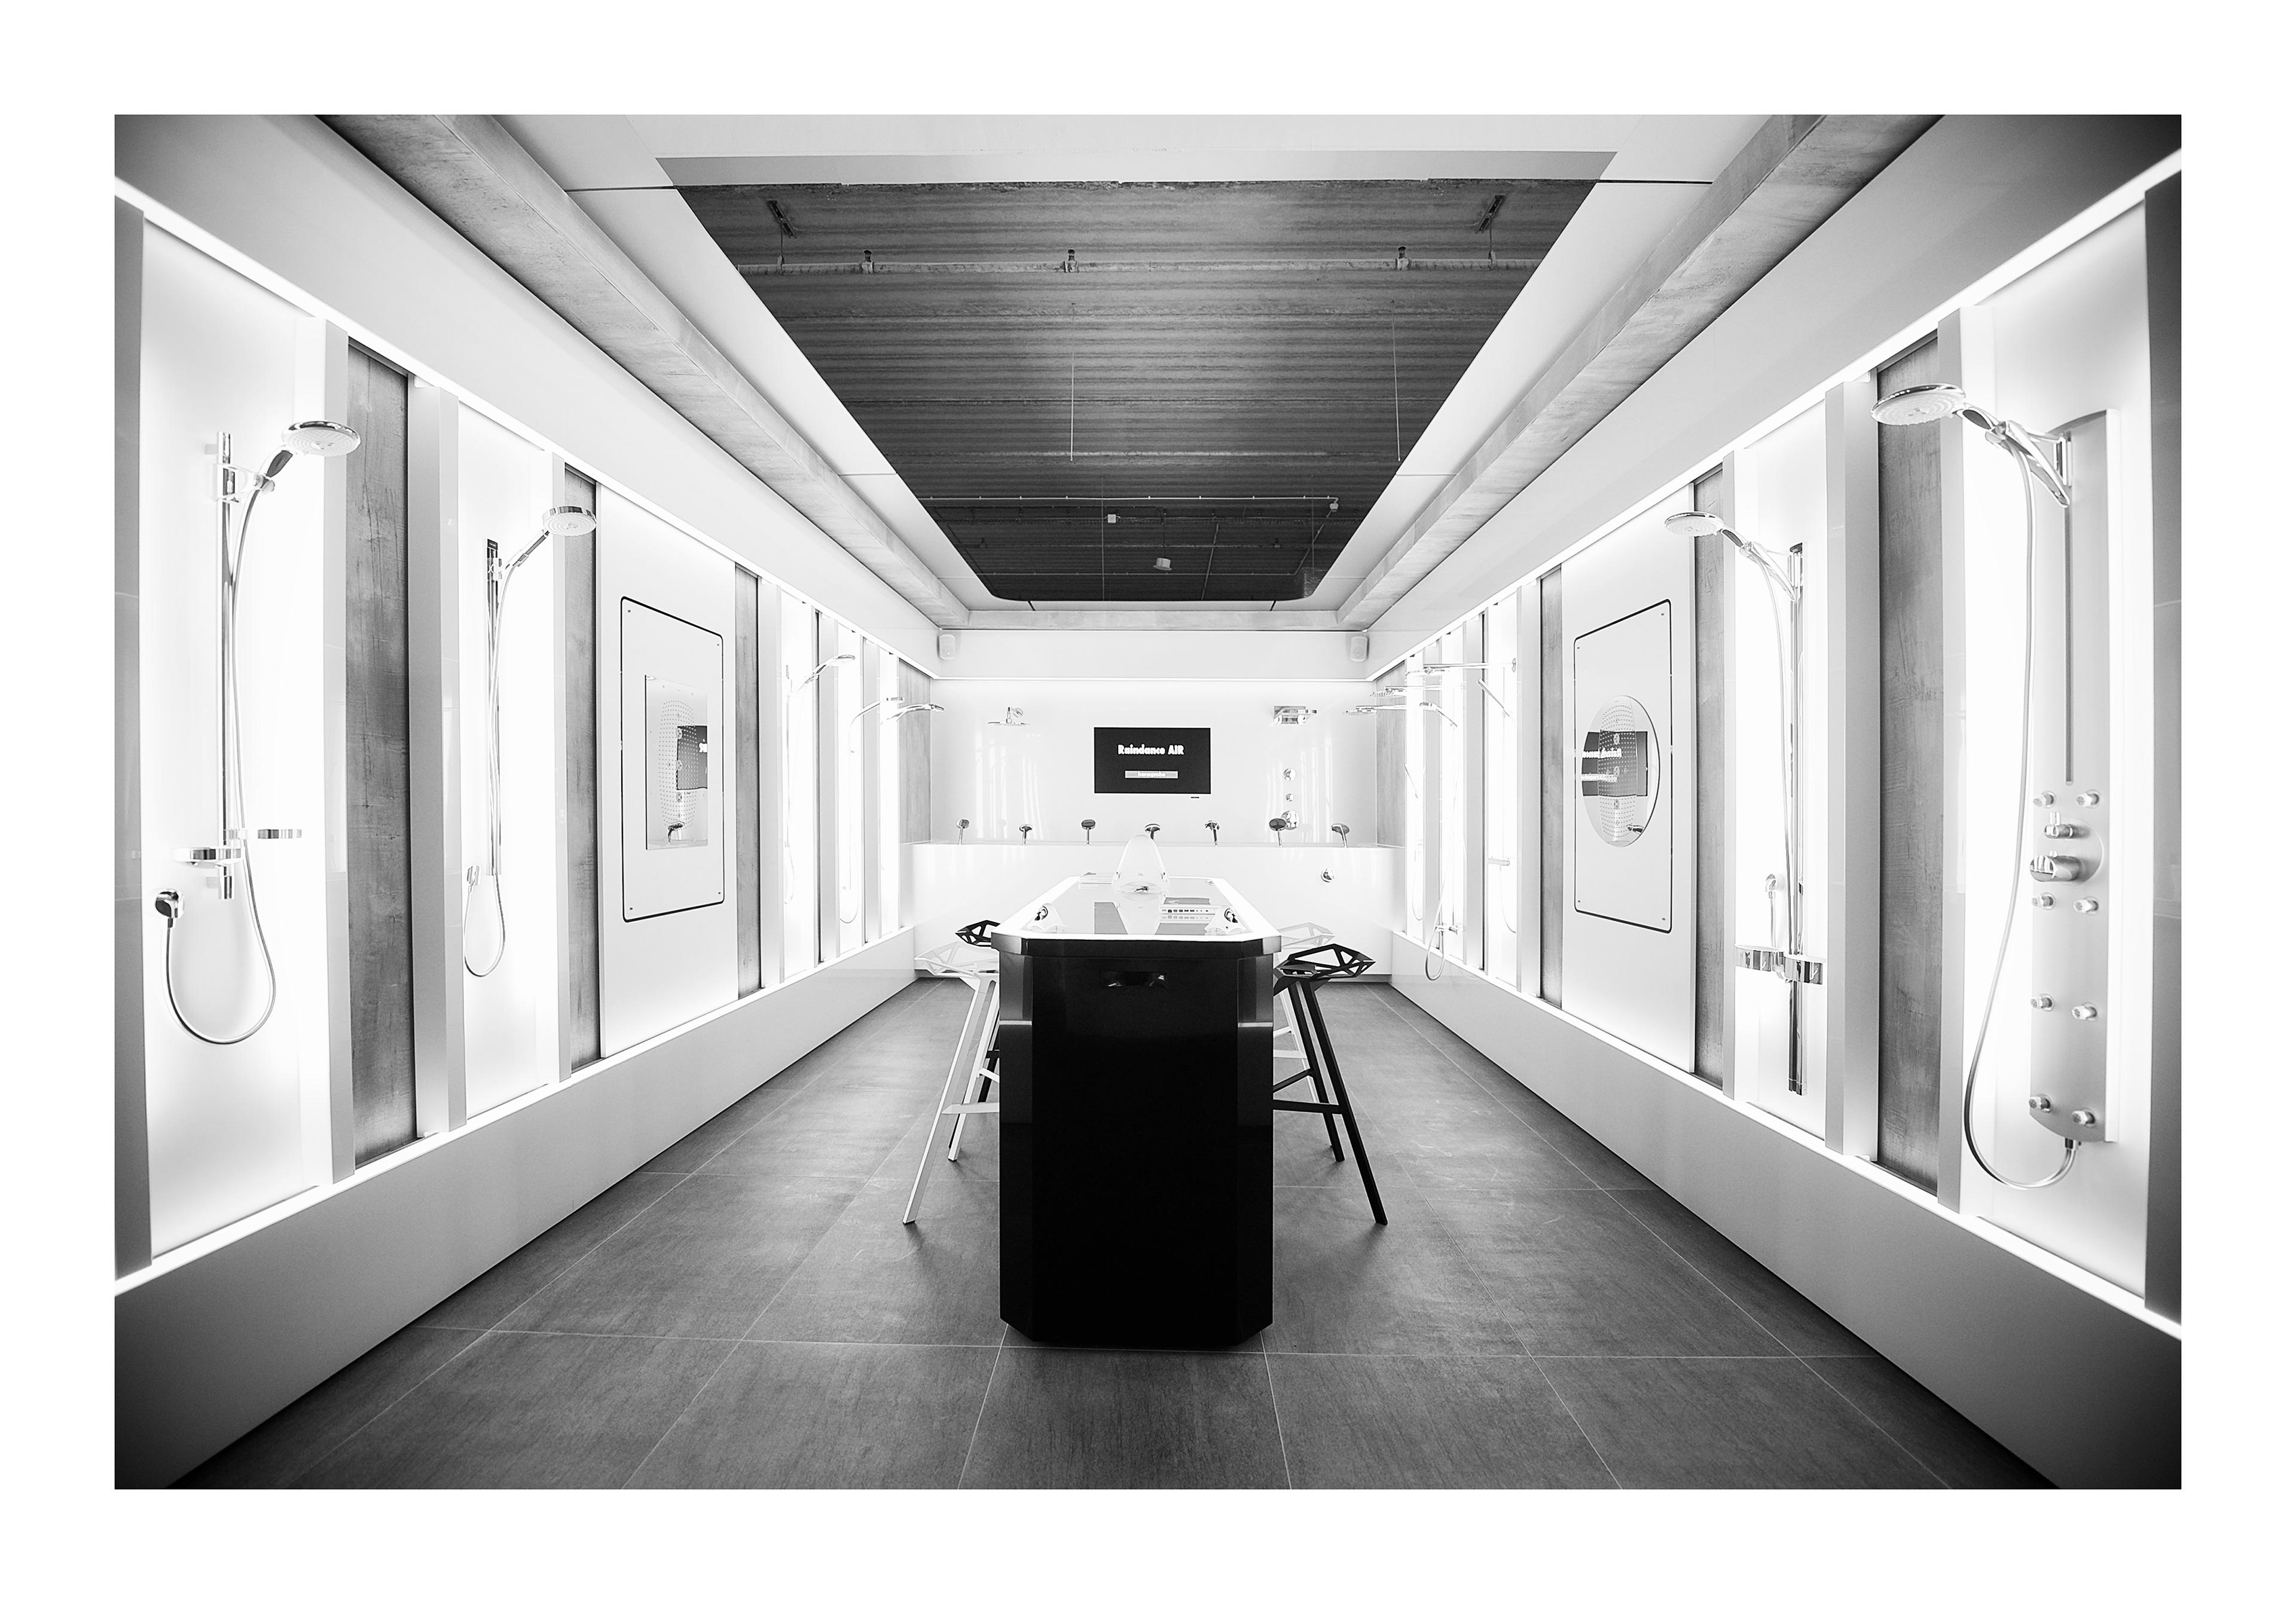 Brickworks - Hansgrohe Showroom